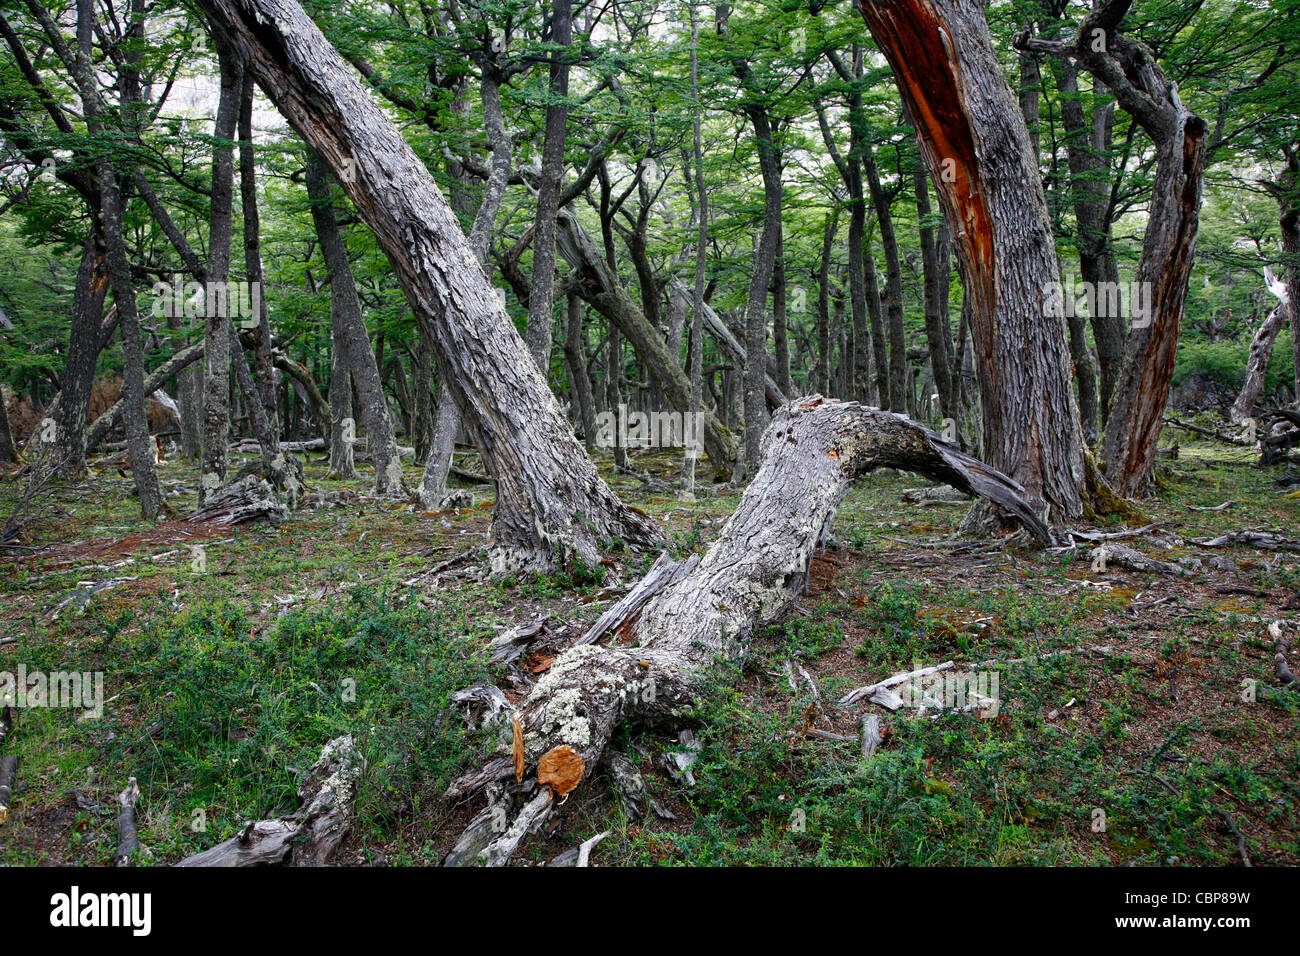 Southern Beech forest at Los Glaciares National Park, El Calafate area, Santa Cruz province. Patagonia. Argentina. - Stock Image